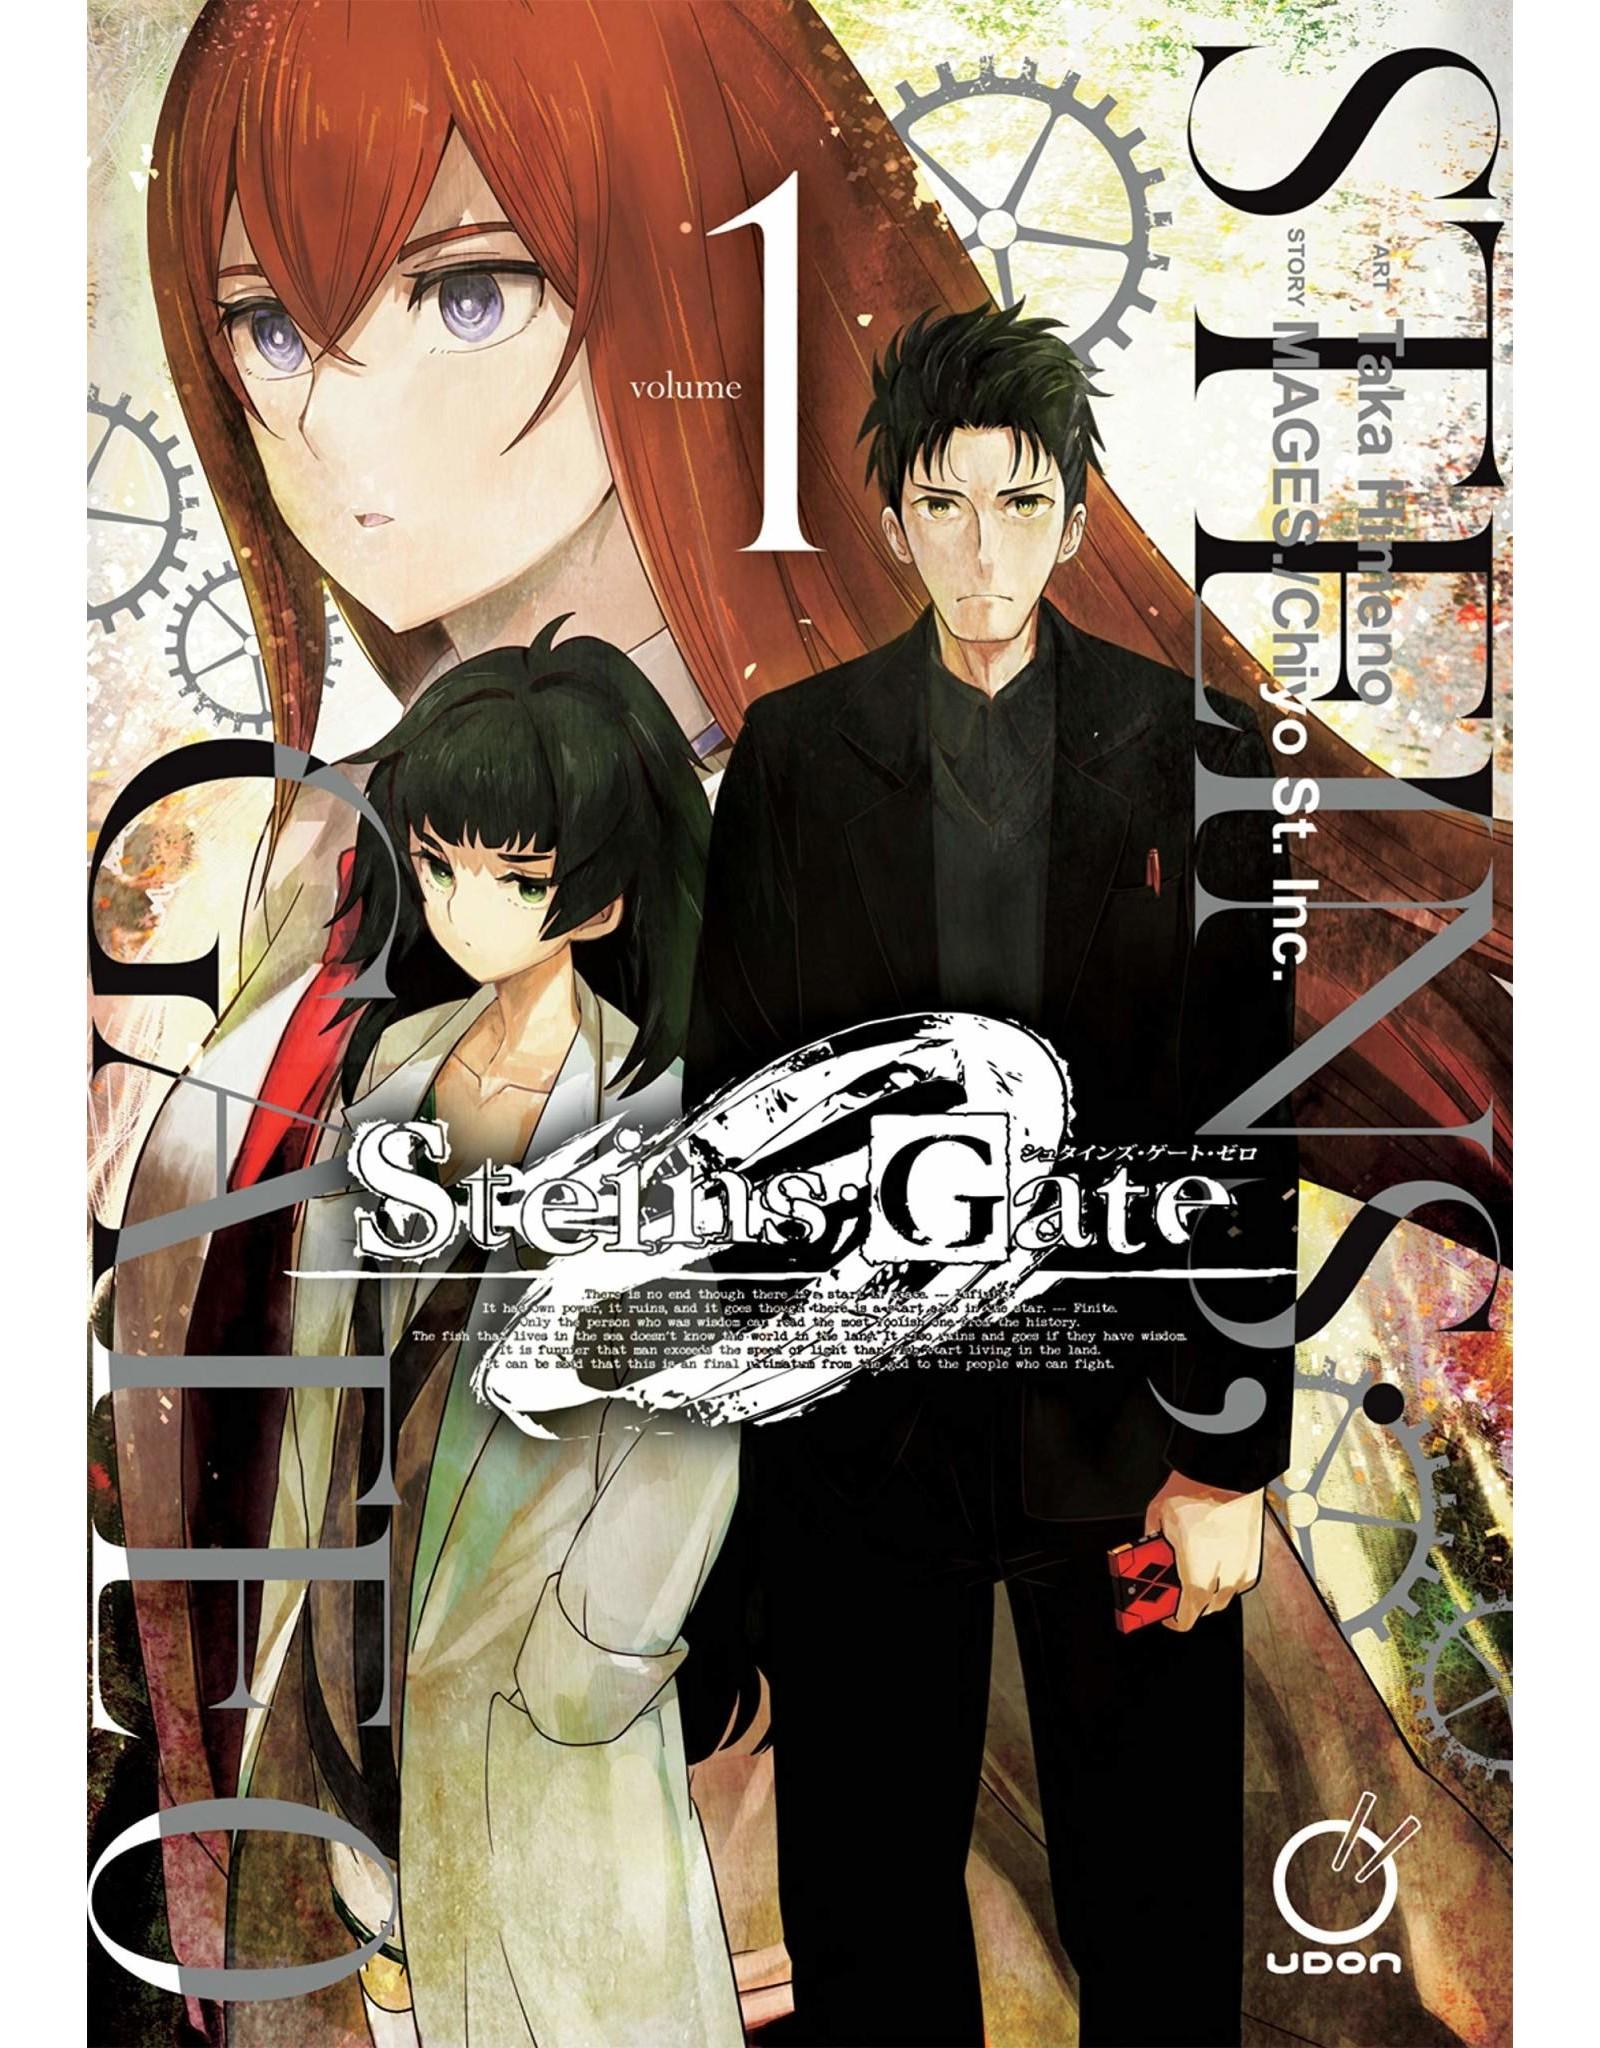 Steins;Gate 0 Volume 1 (Engelstalig) - Manga